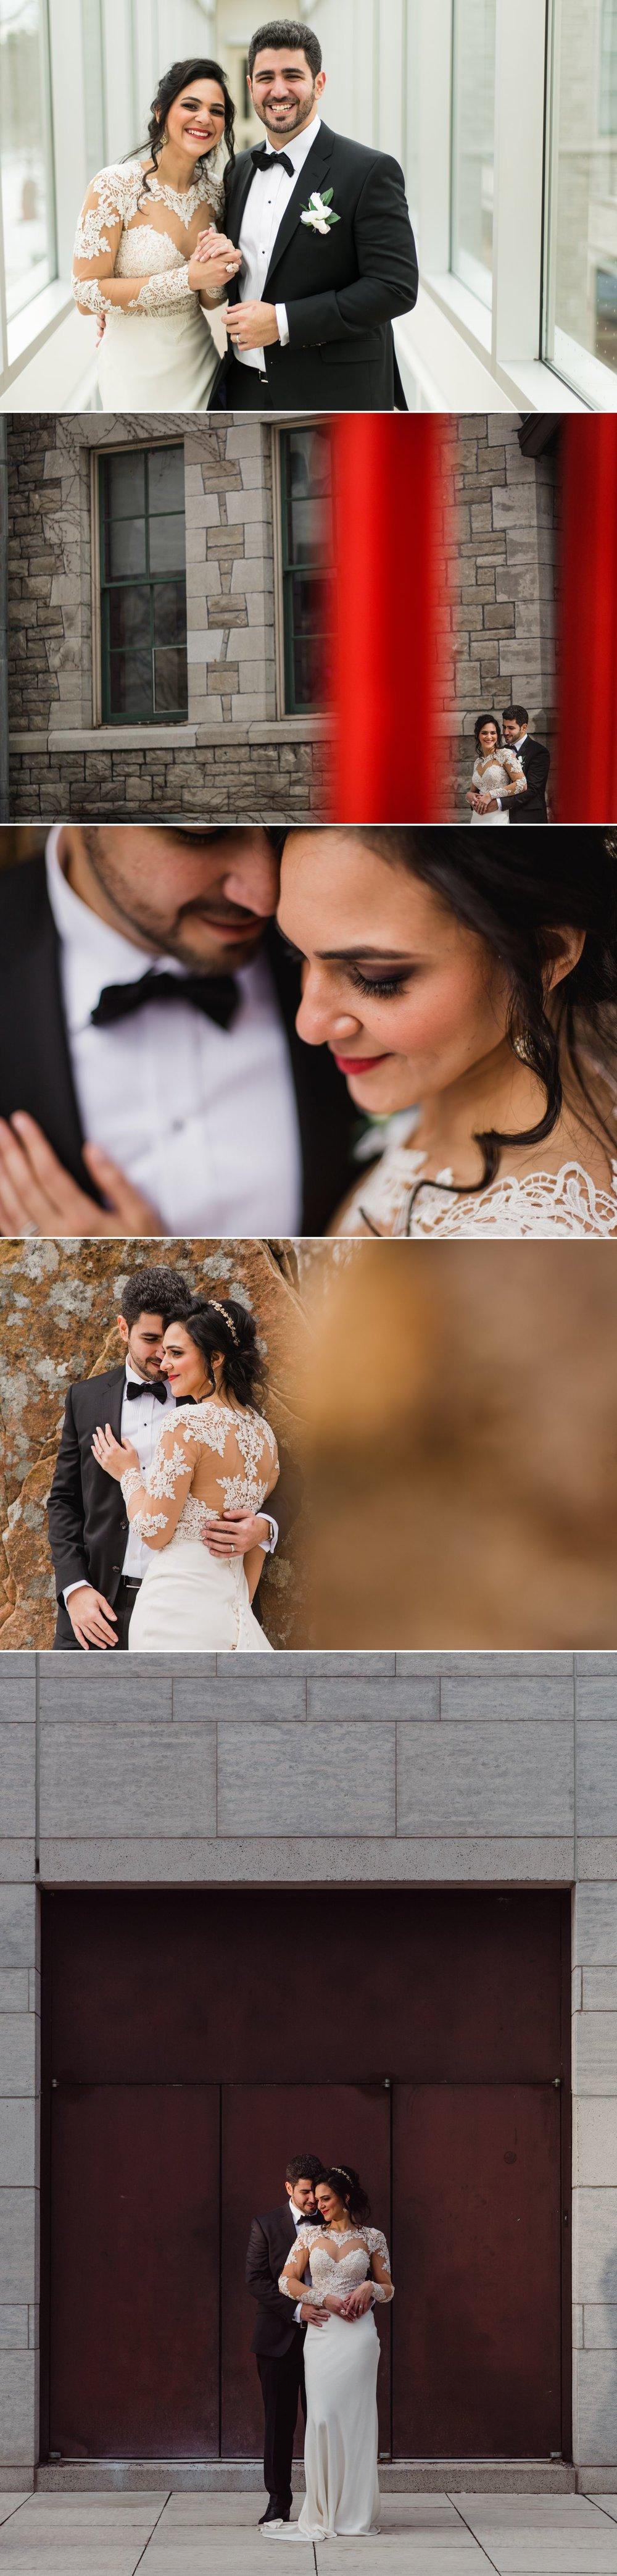 Sofia + Bassel-couples-wedding-portraits-City-Hall-Ottawa.jpg